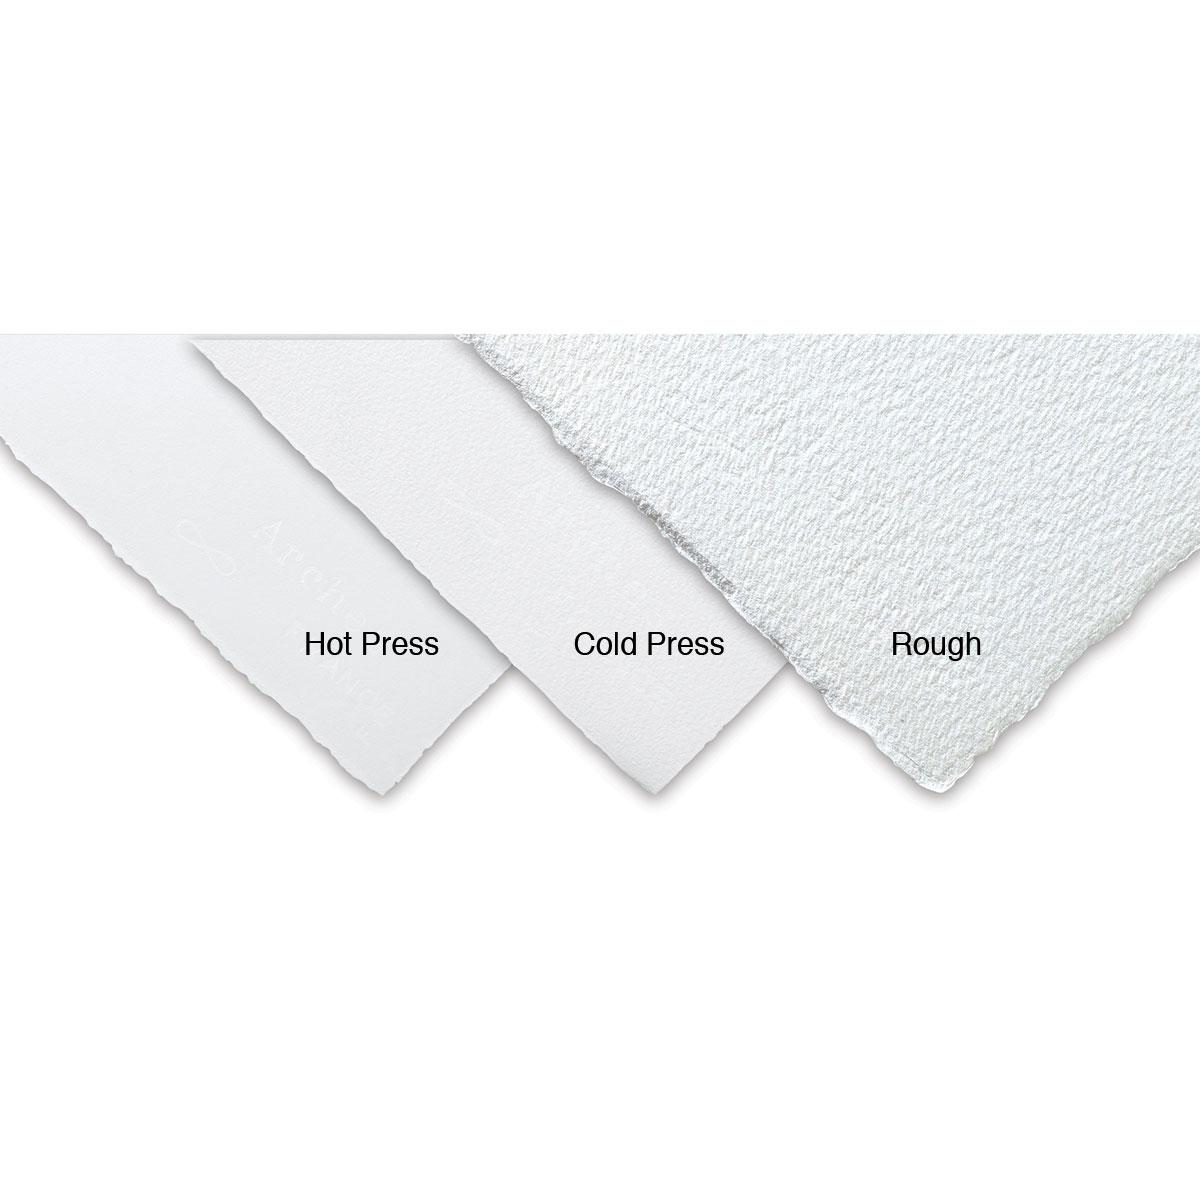 Arches Watercolor Paper Bright White 22 x 30 Inches 140 lb 10 Sheets